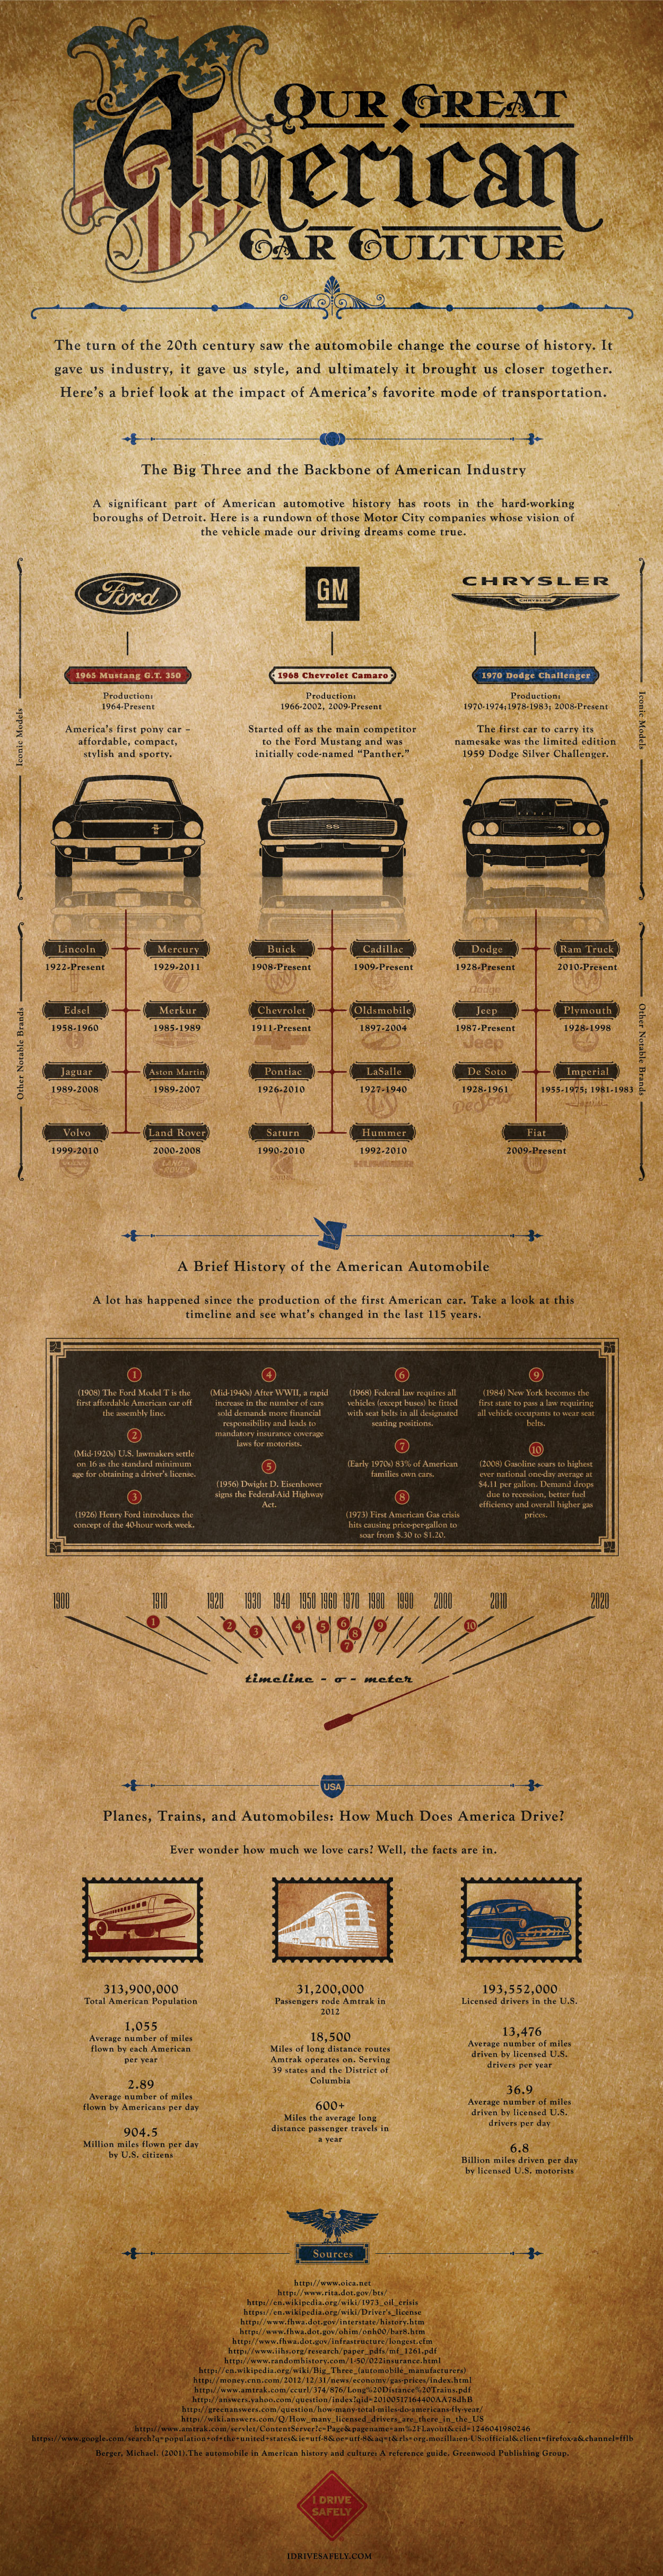 CarCulture_Infographic-Final51